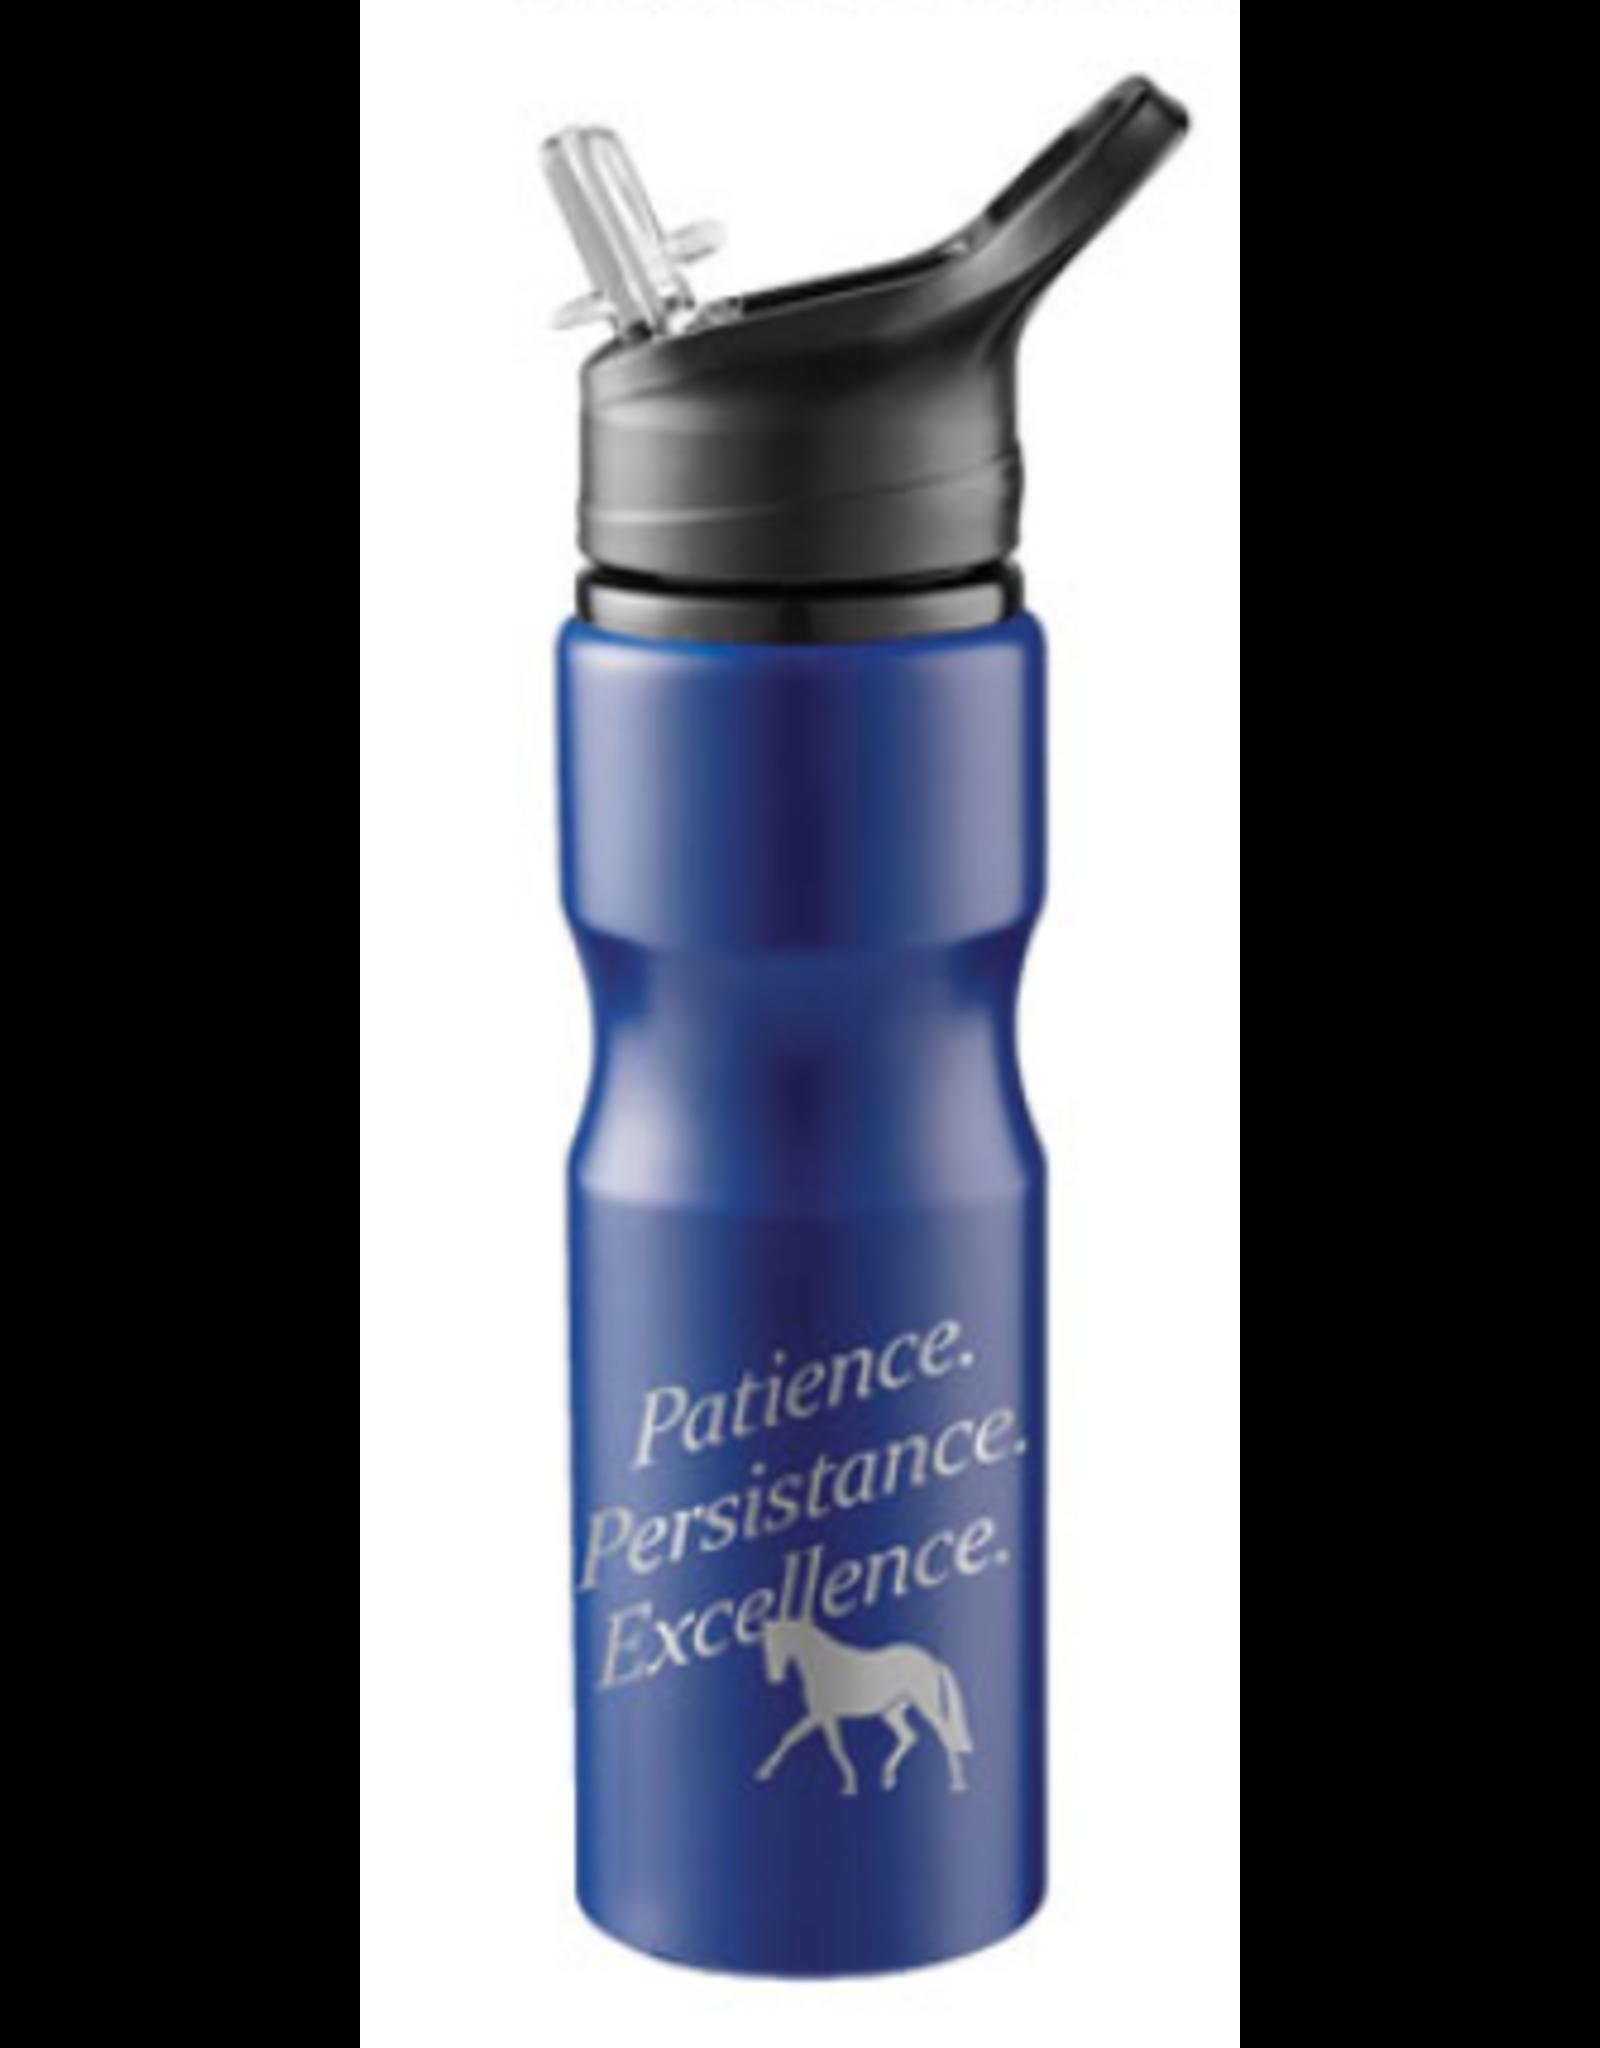 Sports Bottle, 28 oz. Patience, Persistance, Excellence